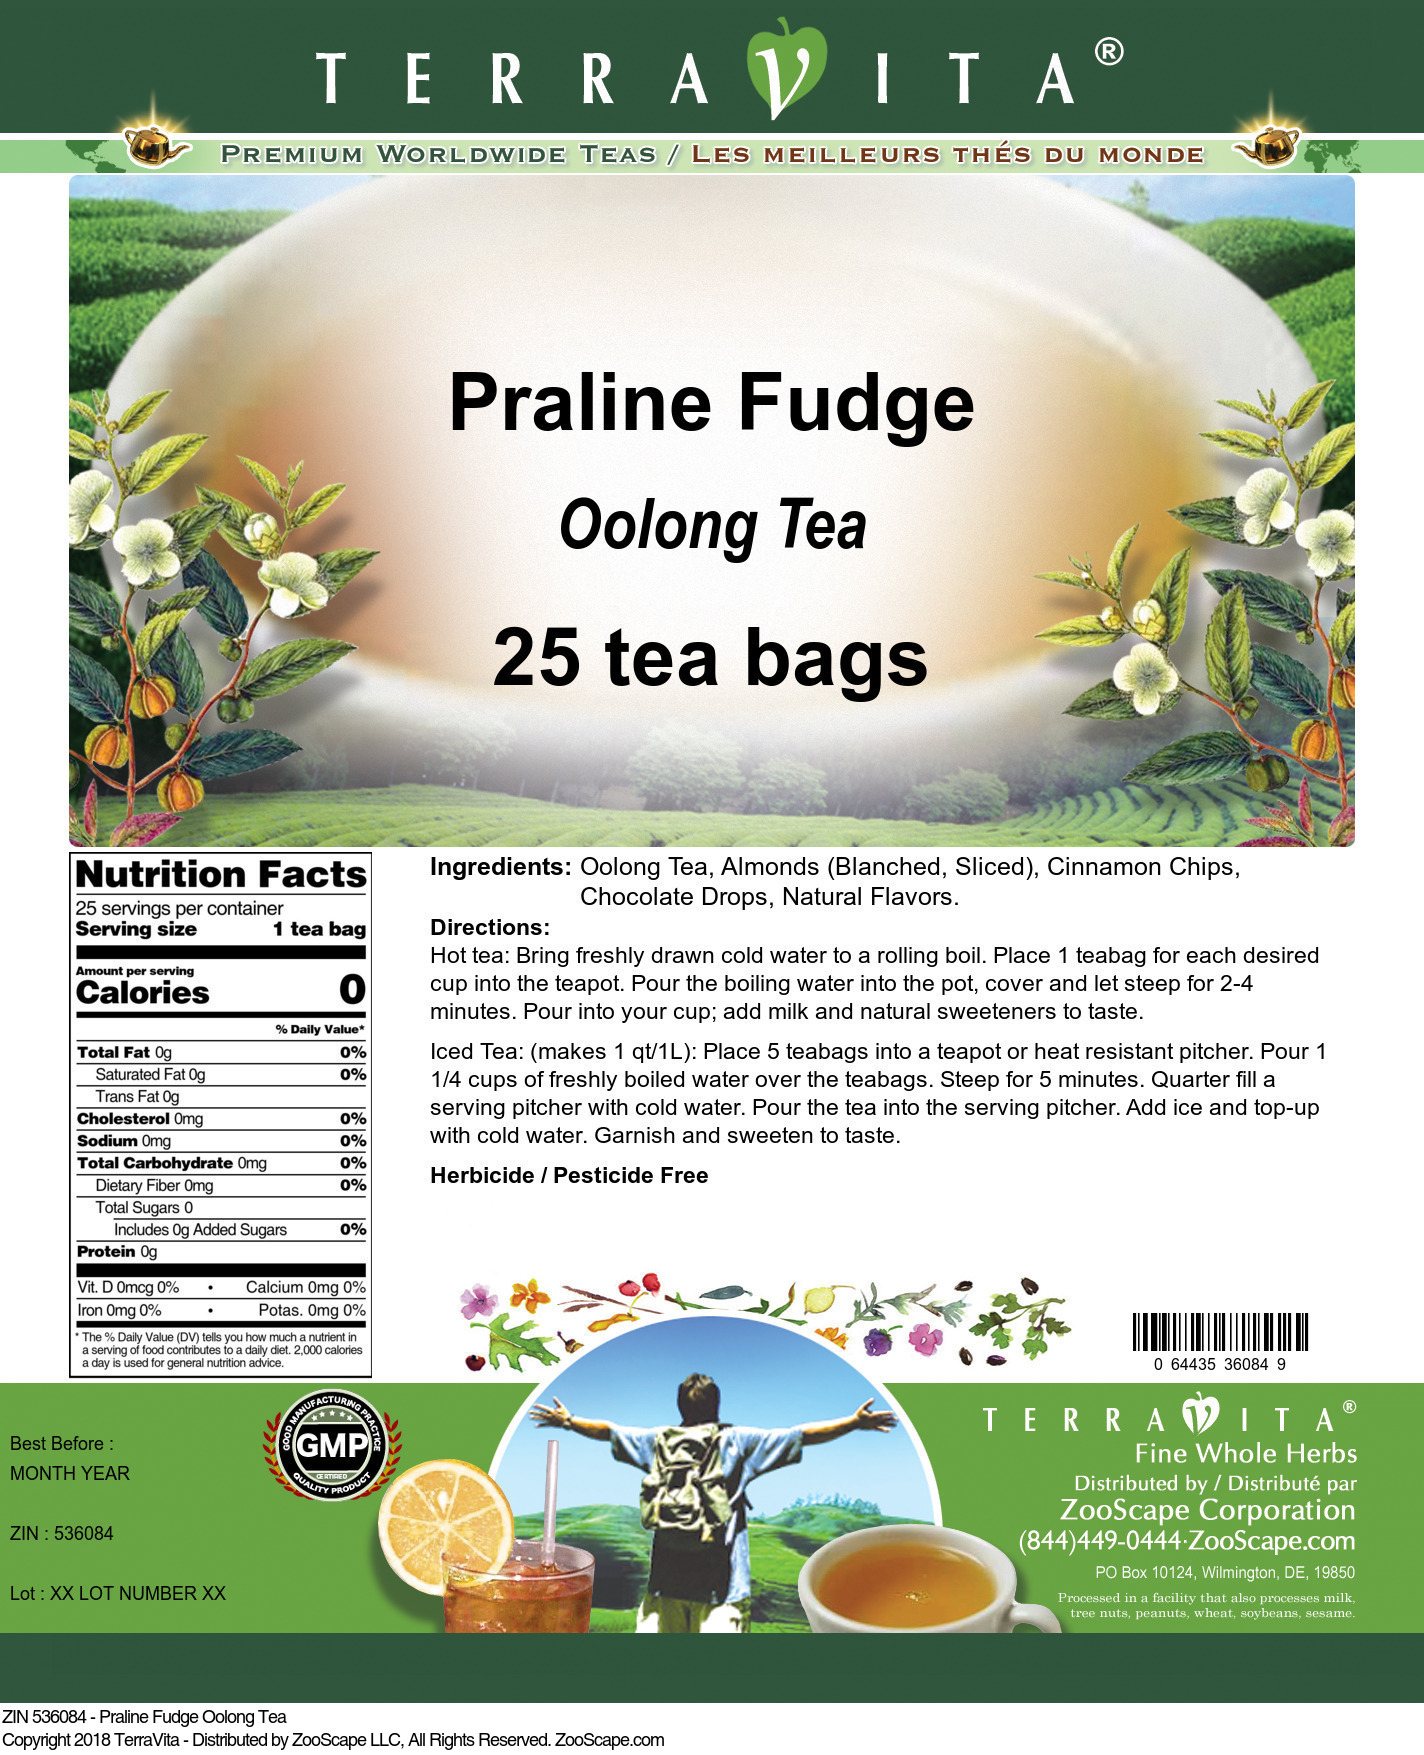 Praline Fudge Oolong Tea